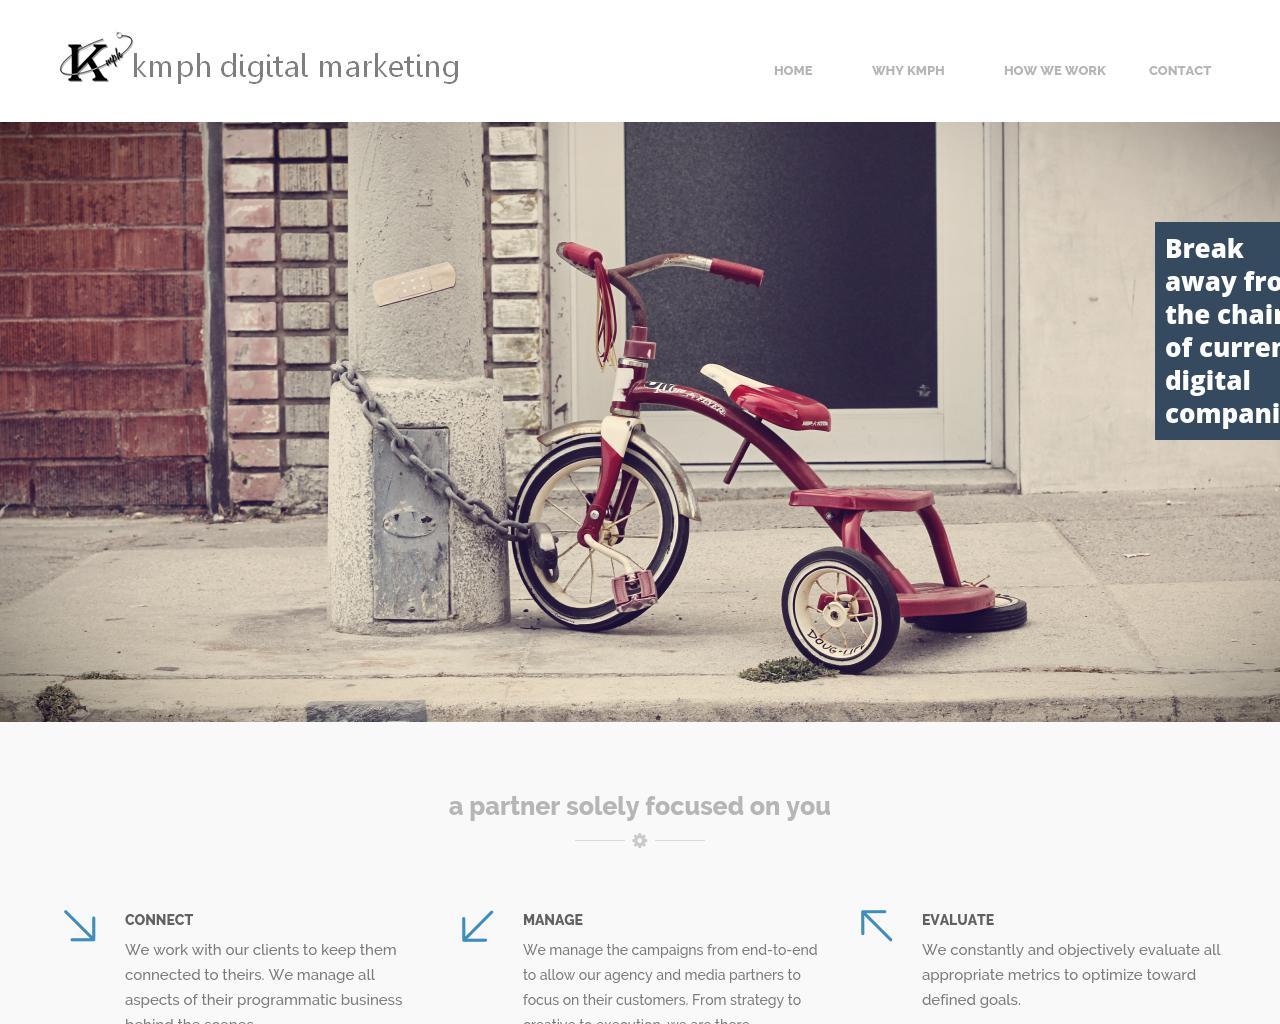 Kmph-Digital-Marketing-Advertising-Reviews-Pricing